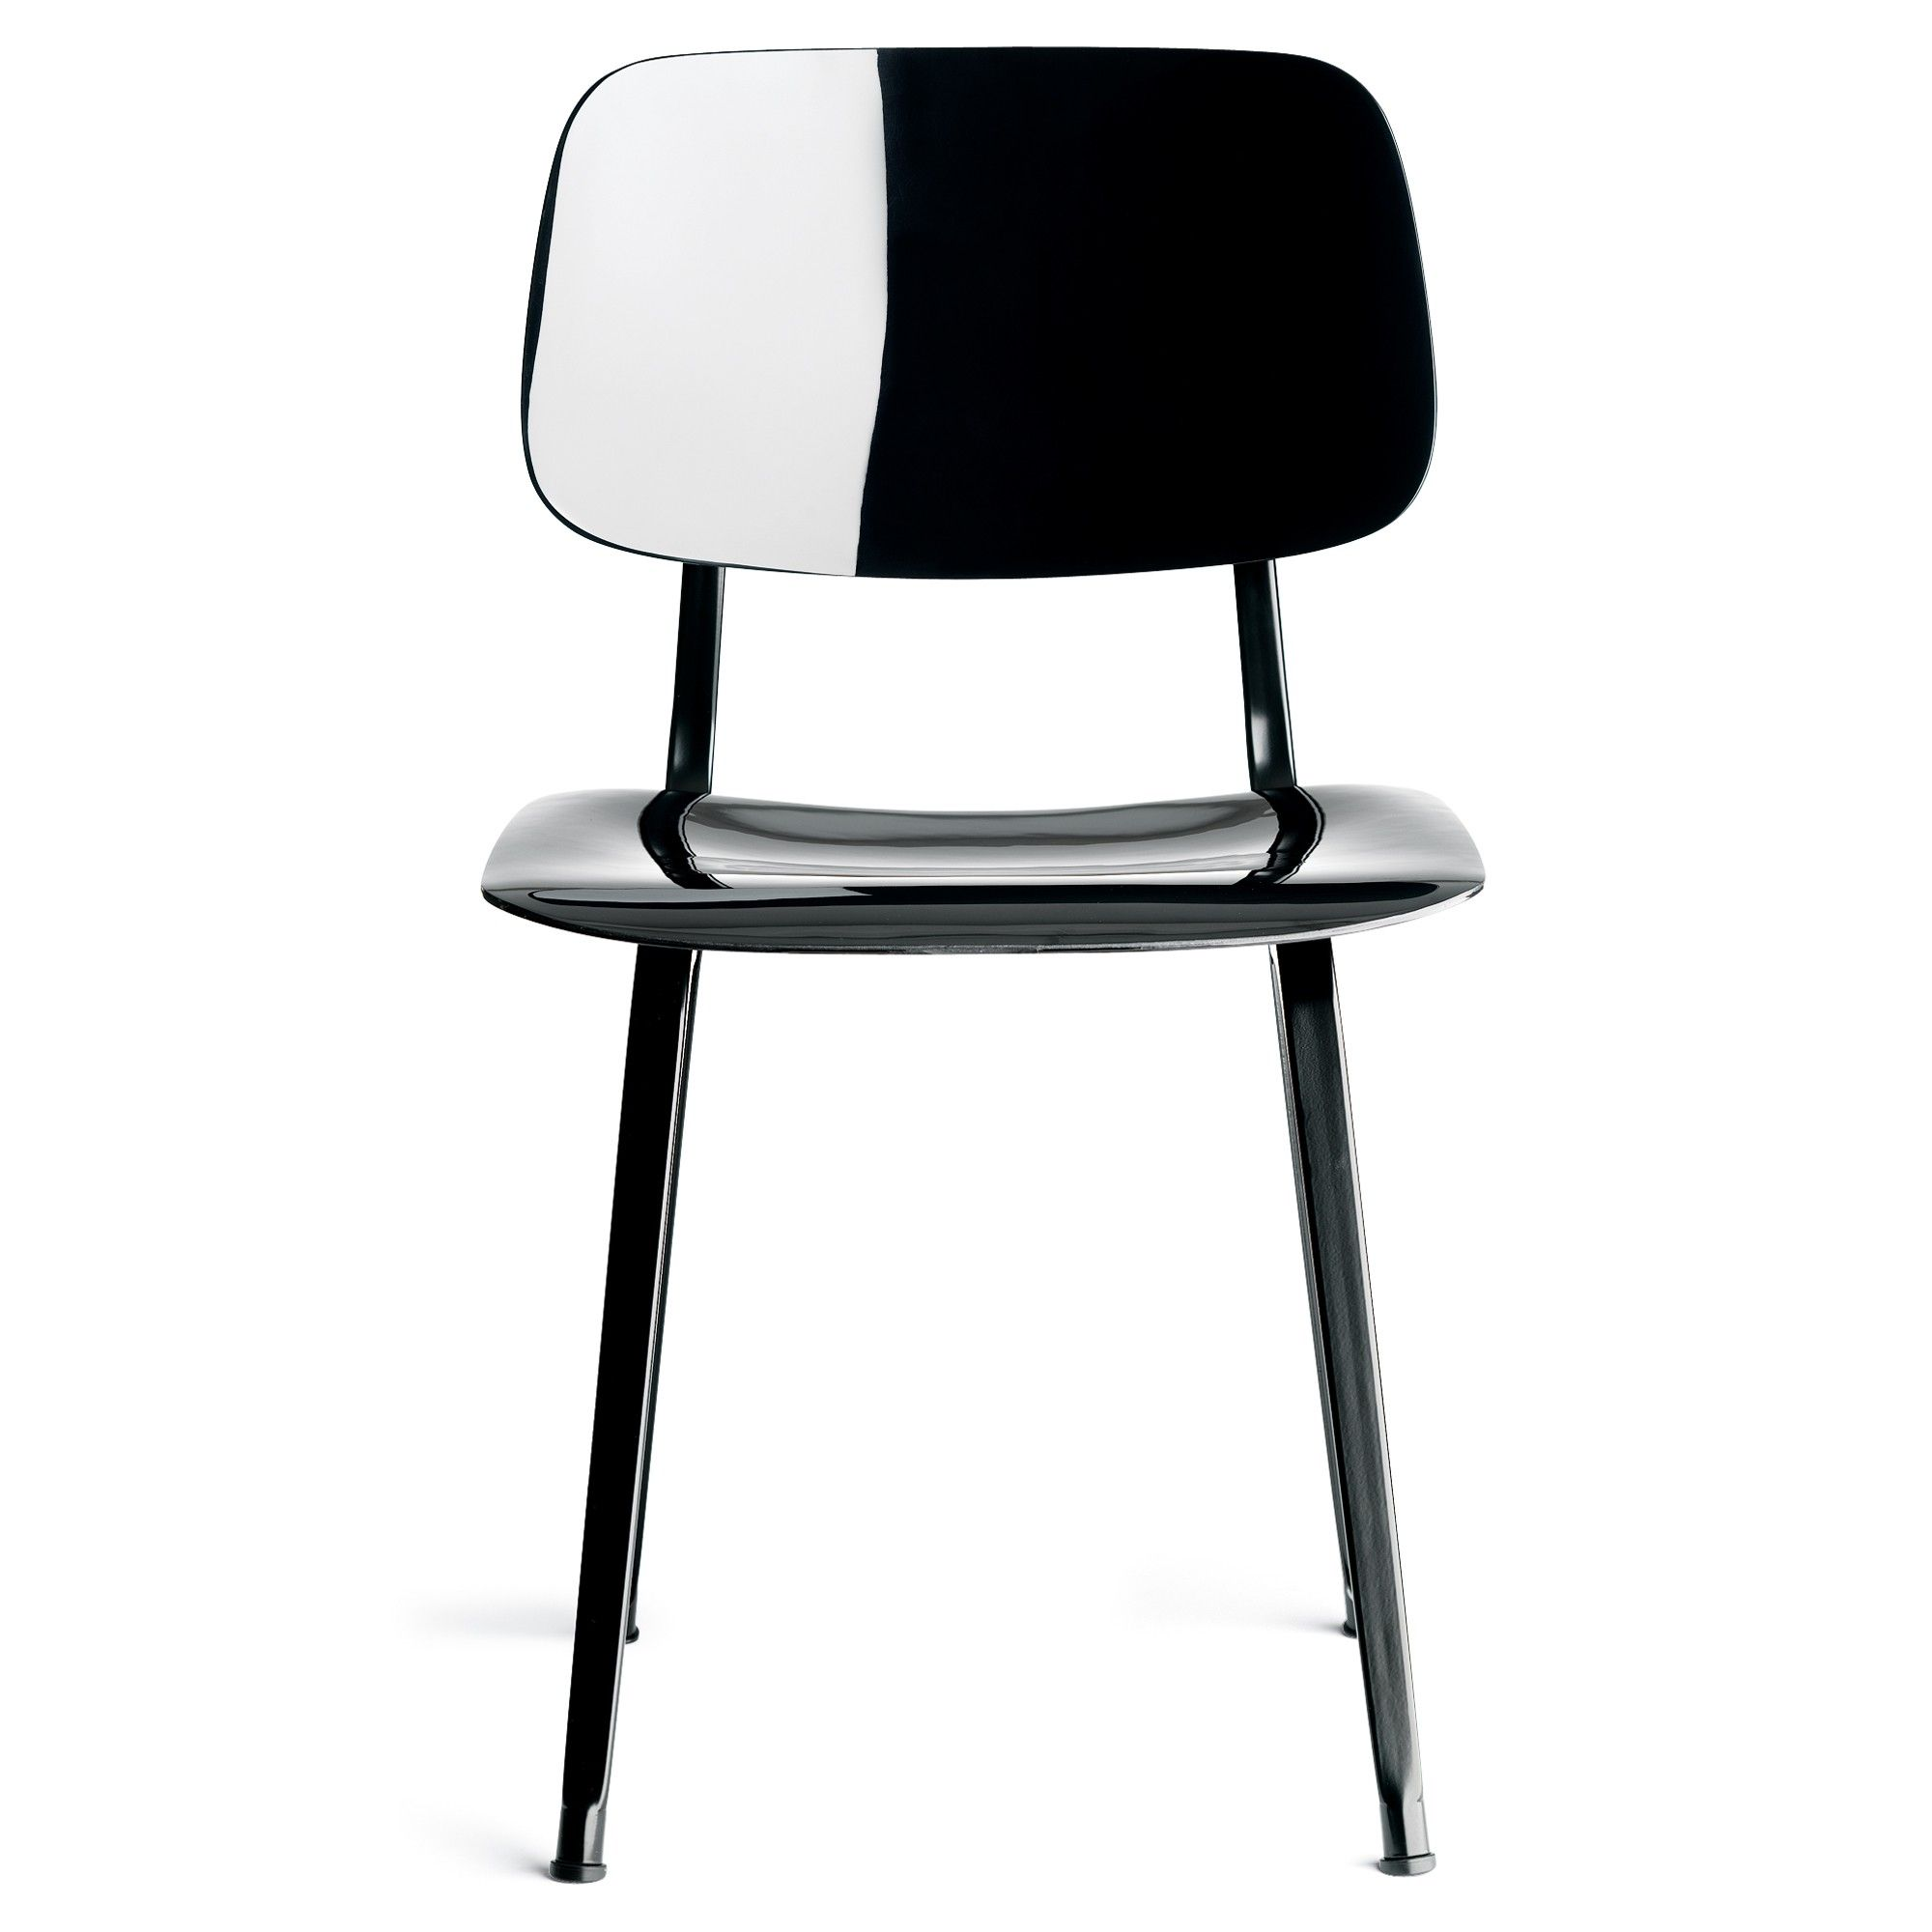 offiz en hoomz - interieuradvies - revolte stoel1